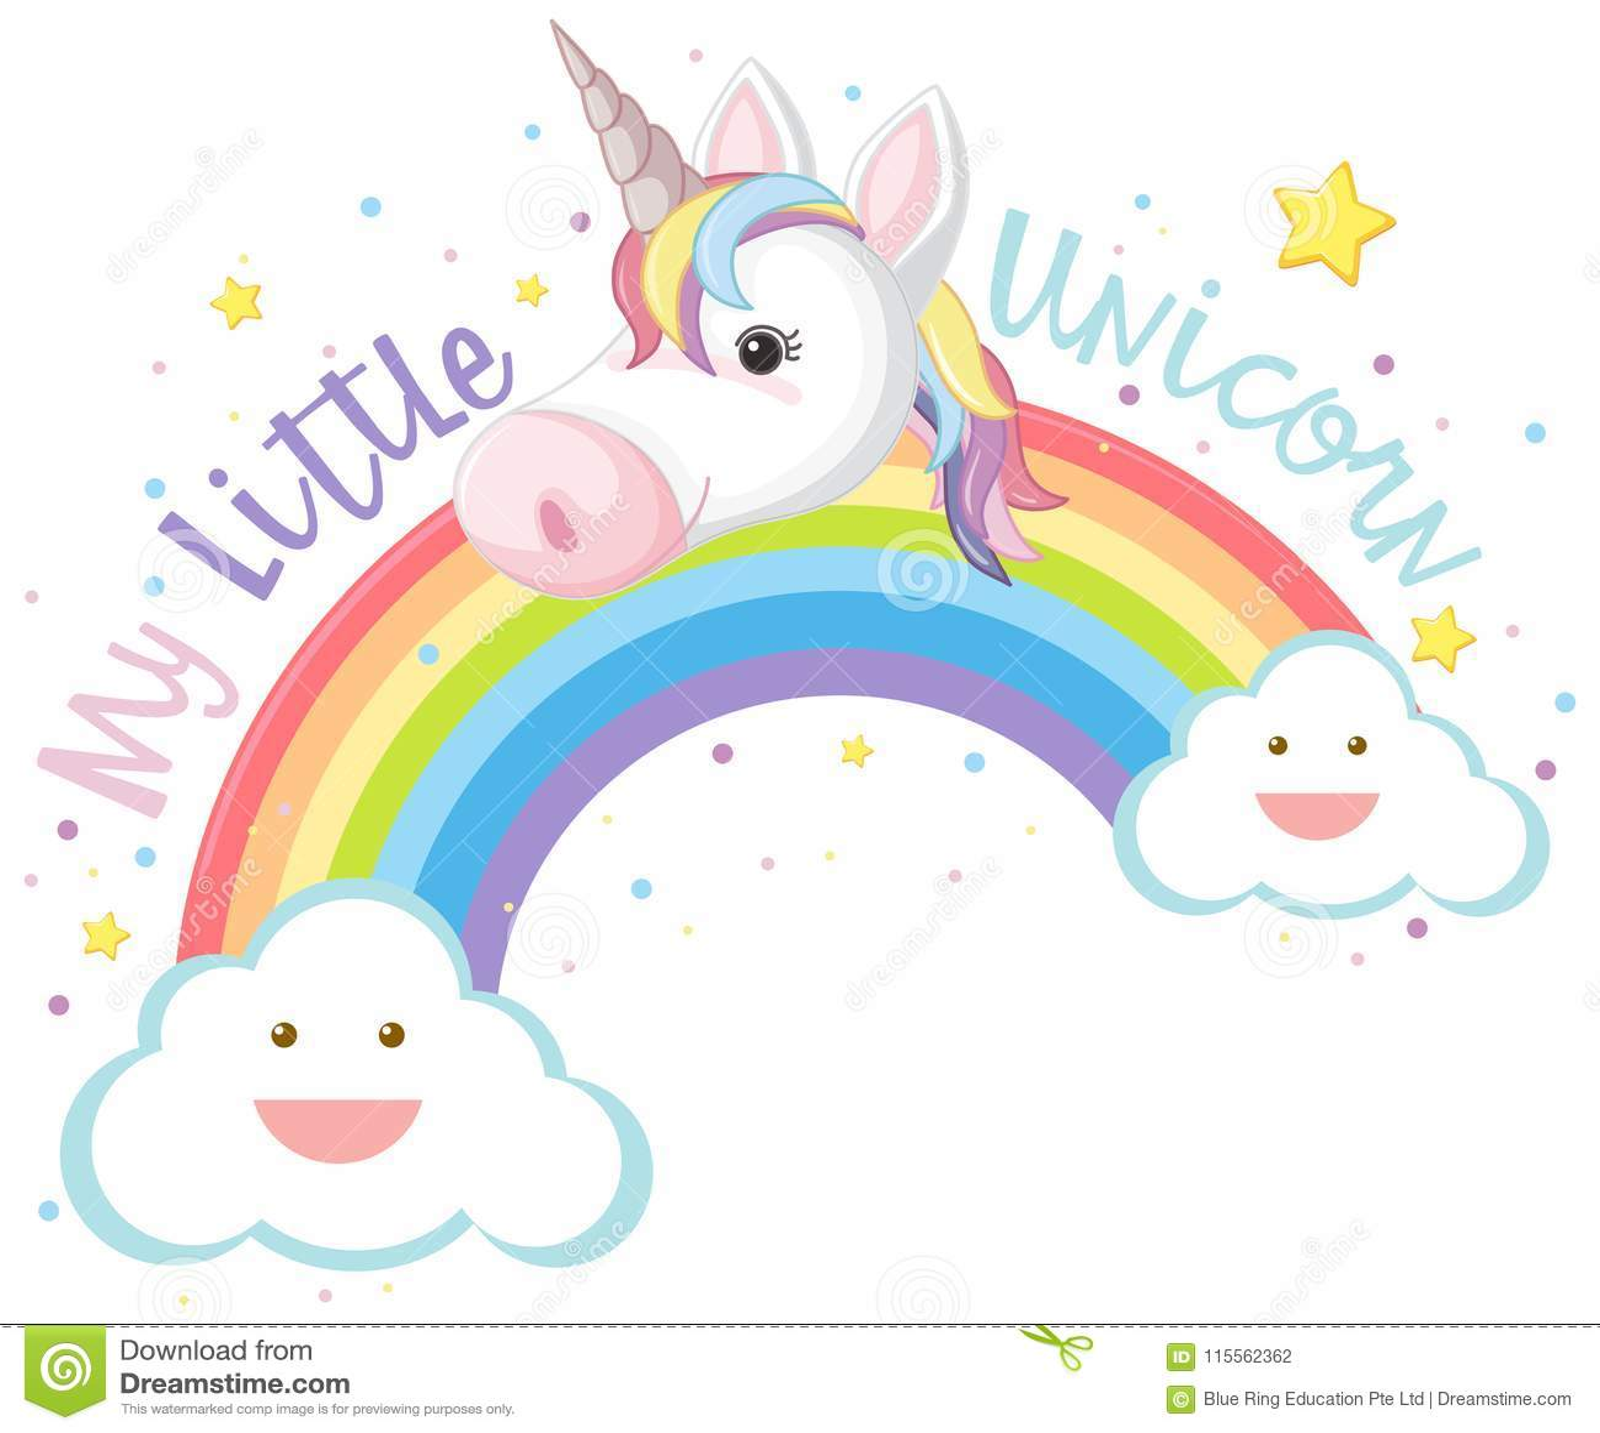 My Little Unicorn and Rainbow